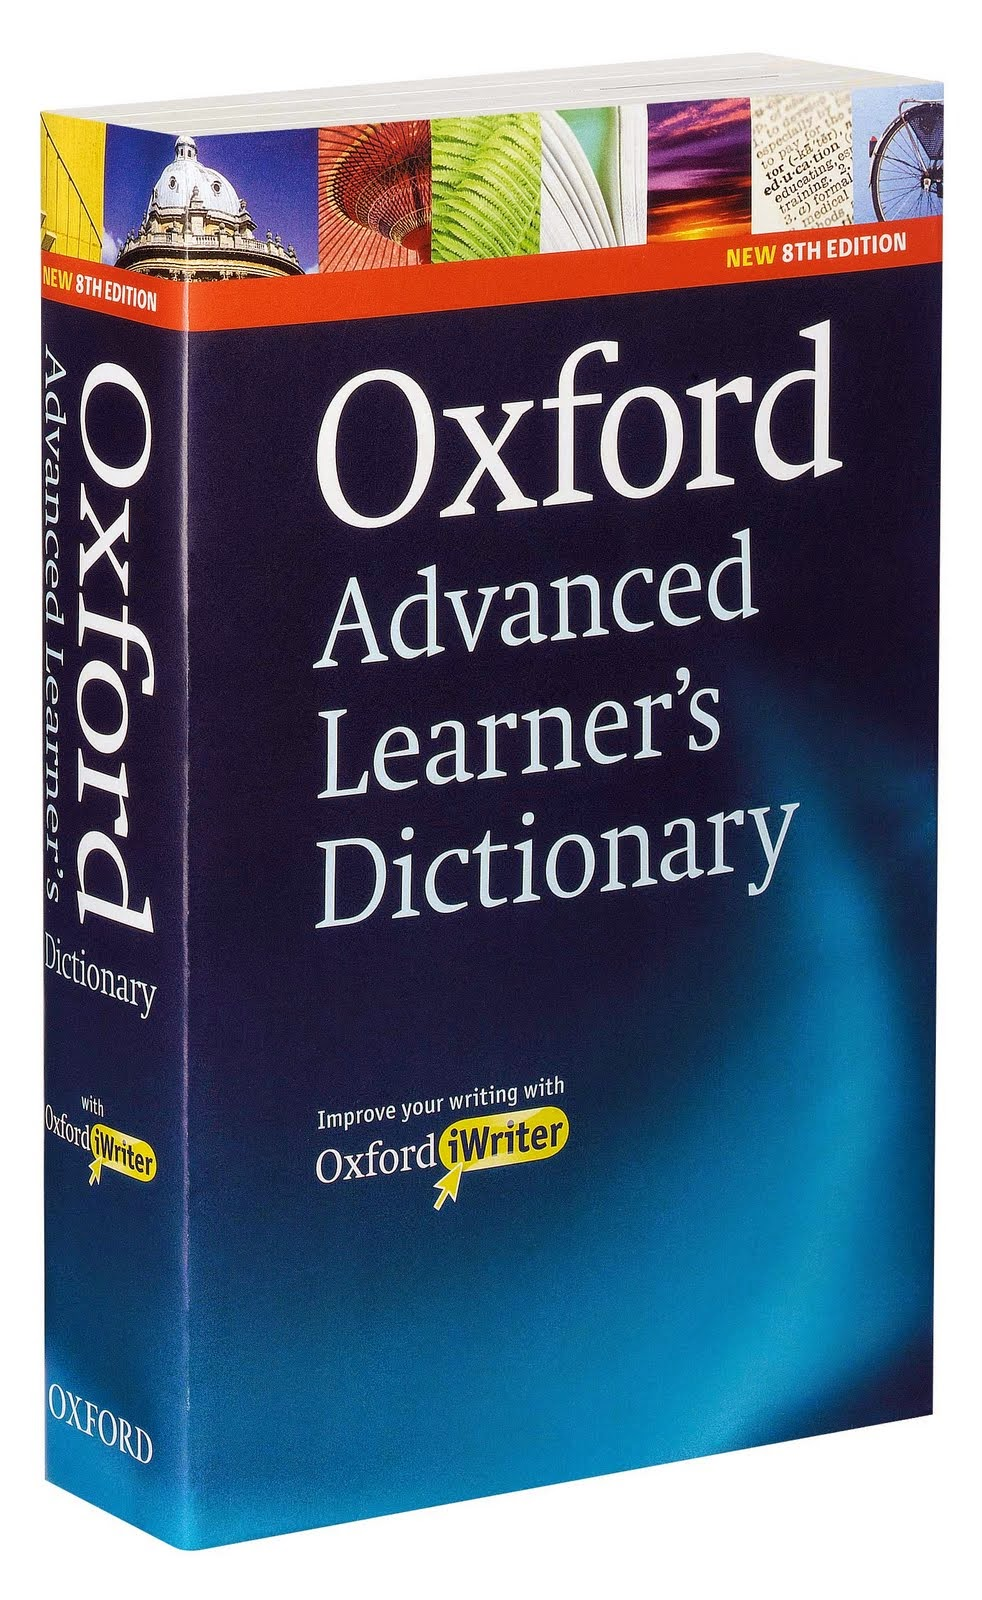 Monolingual dictionary